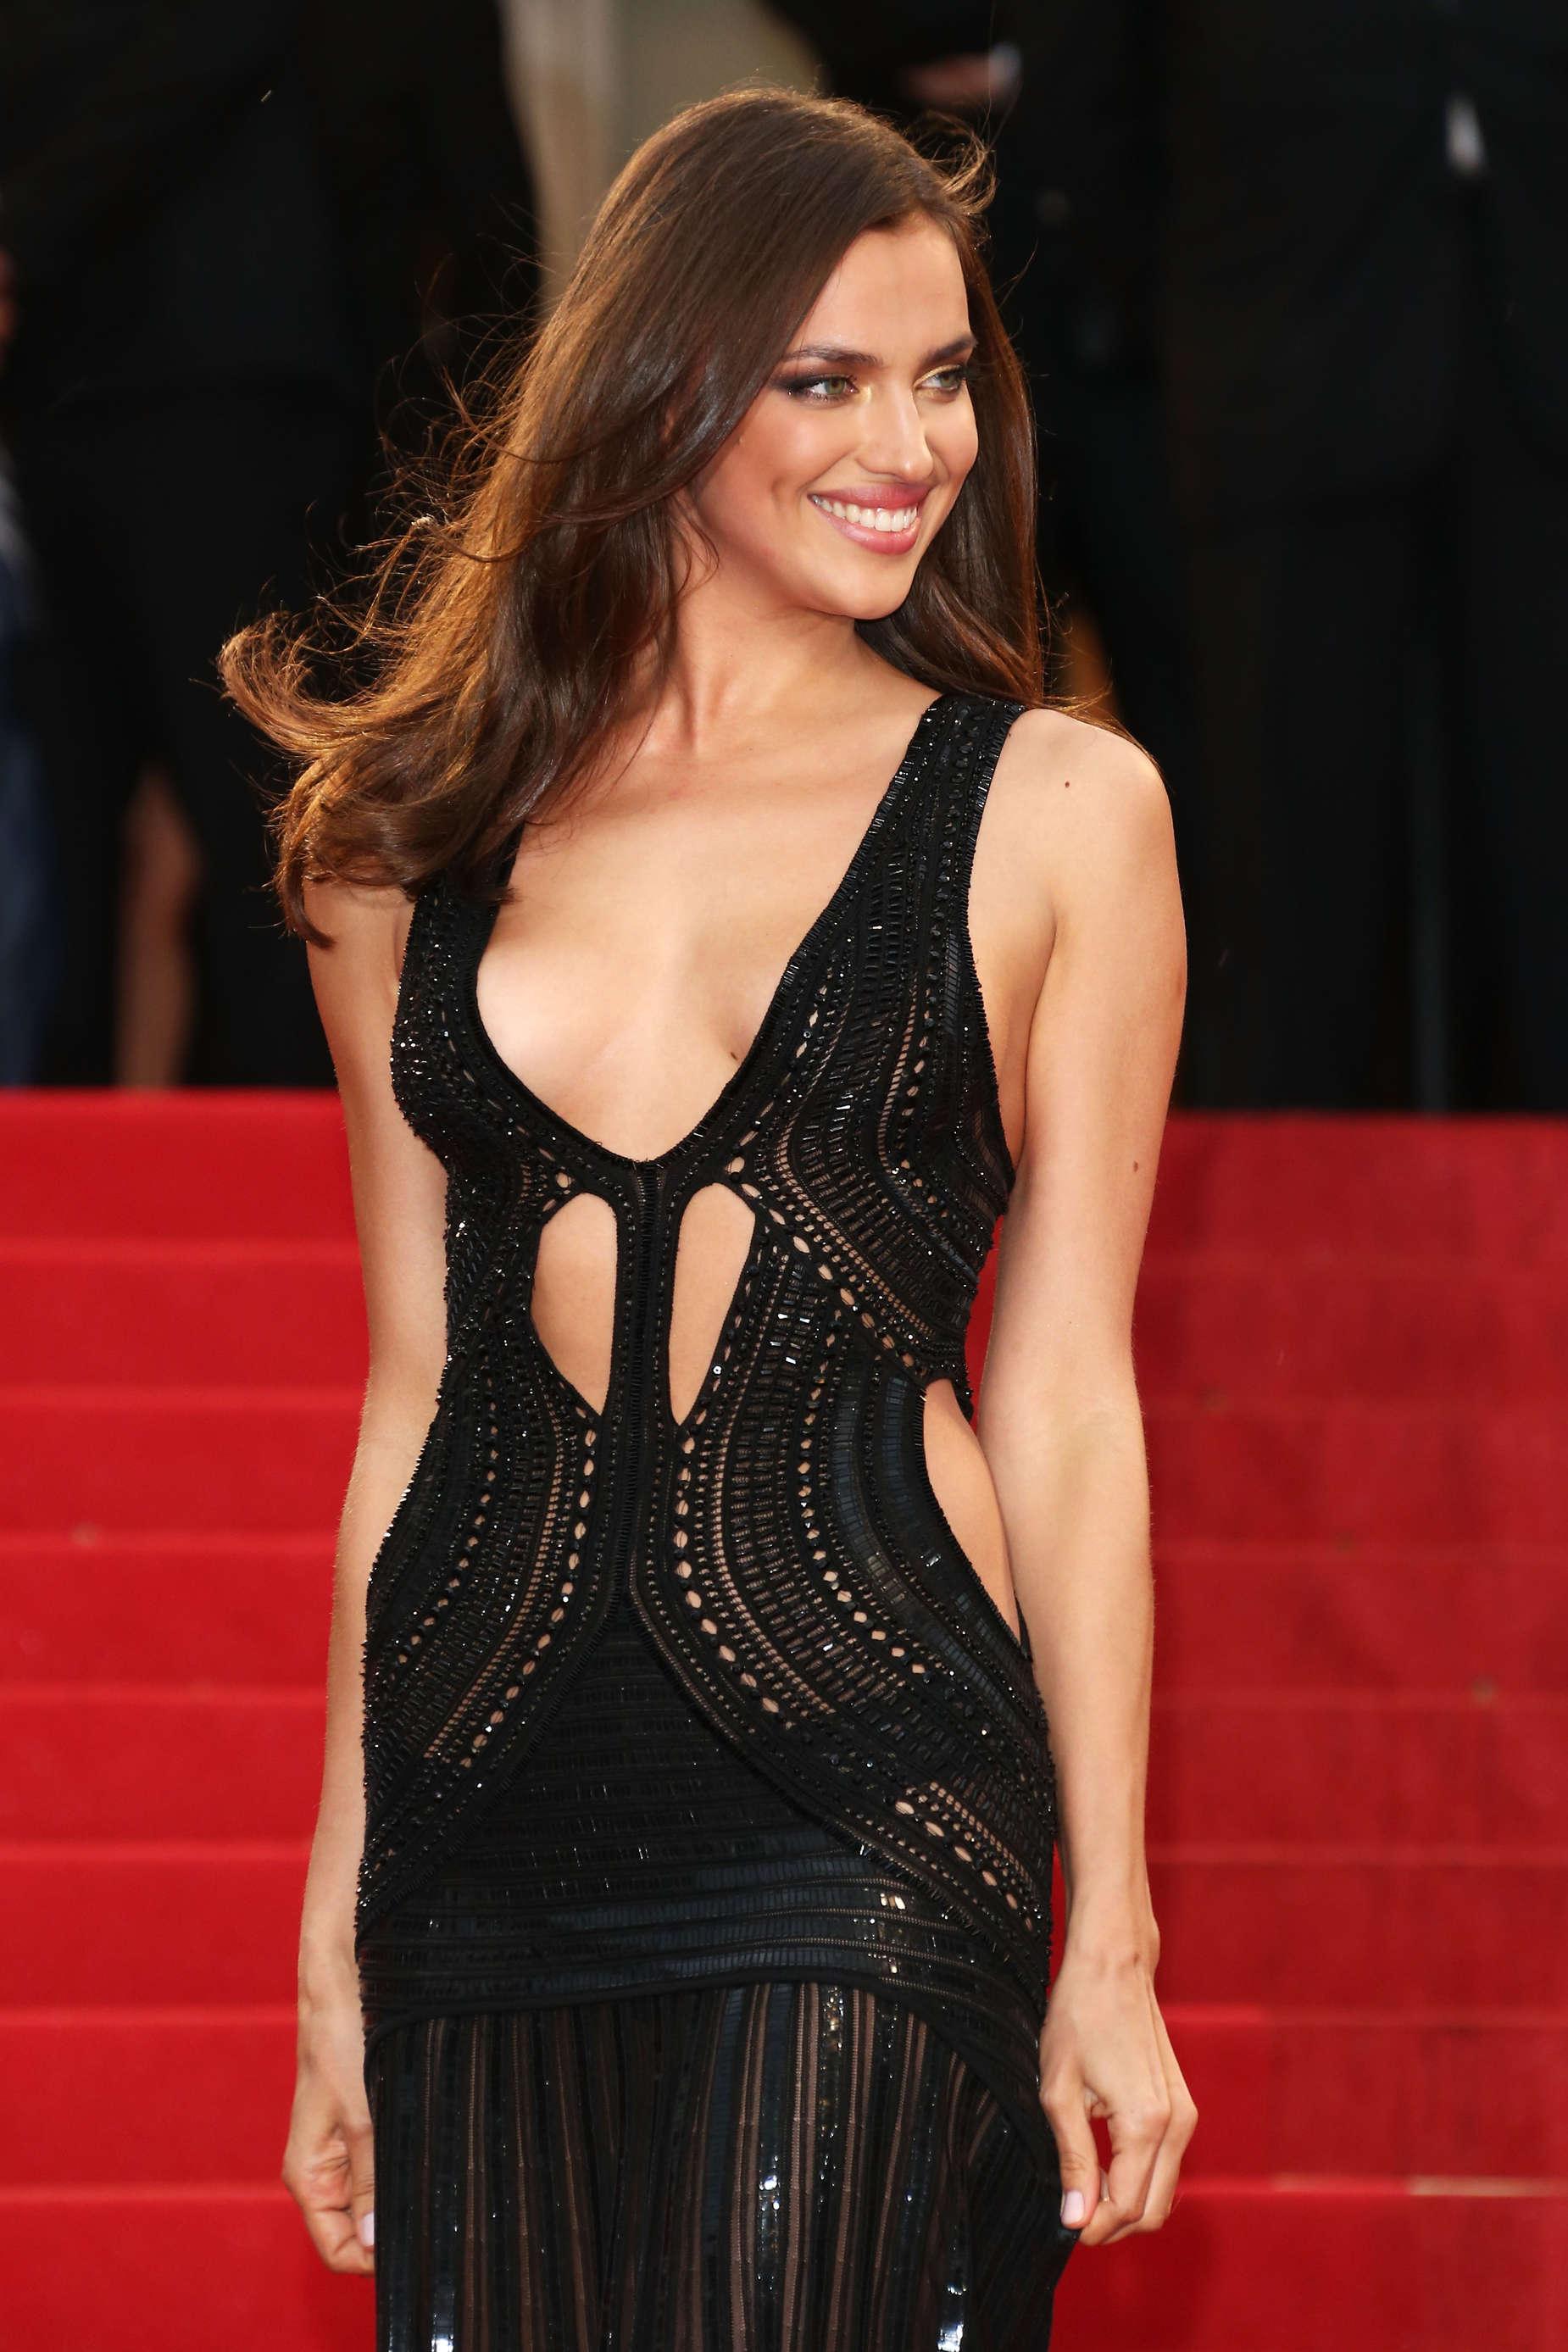 Irina Shayk 2013 : Irina Shayk – All Is Lost Premiere at the 66th Cannes Film Festival -01